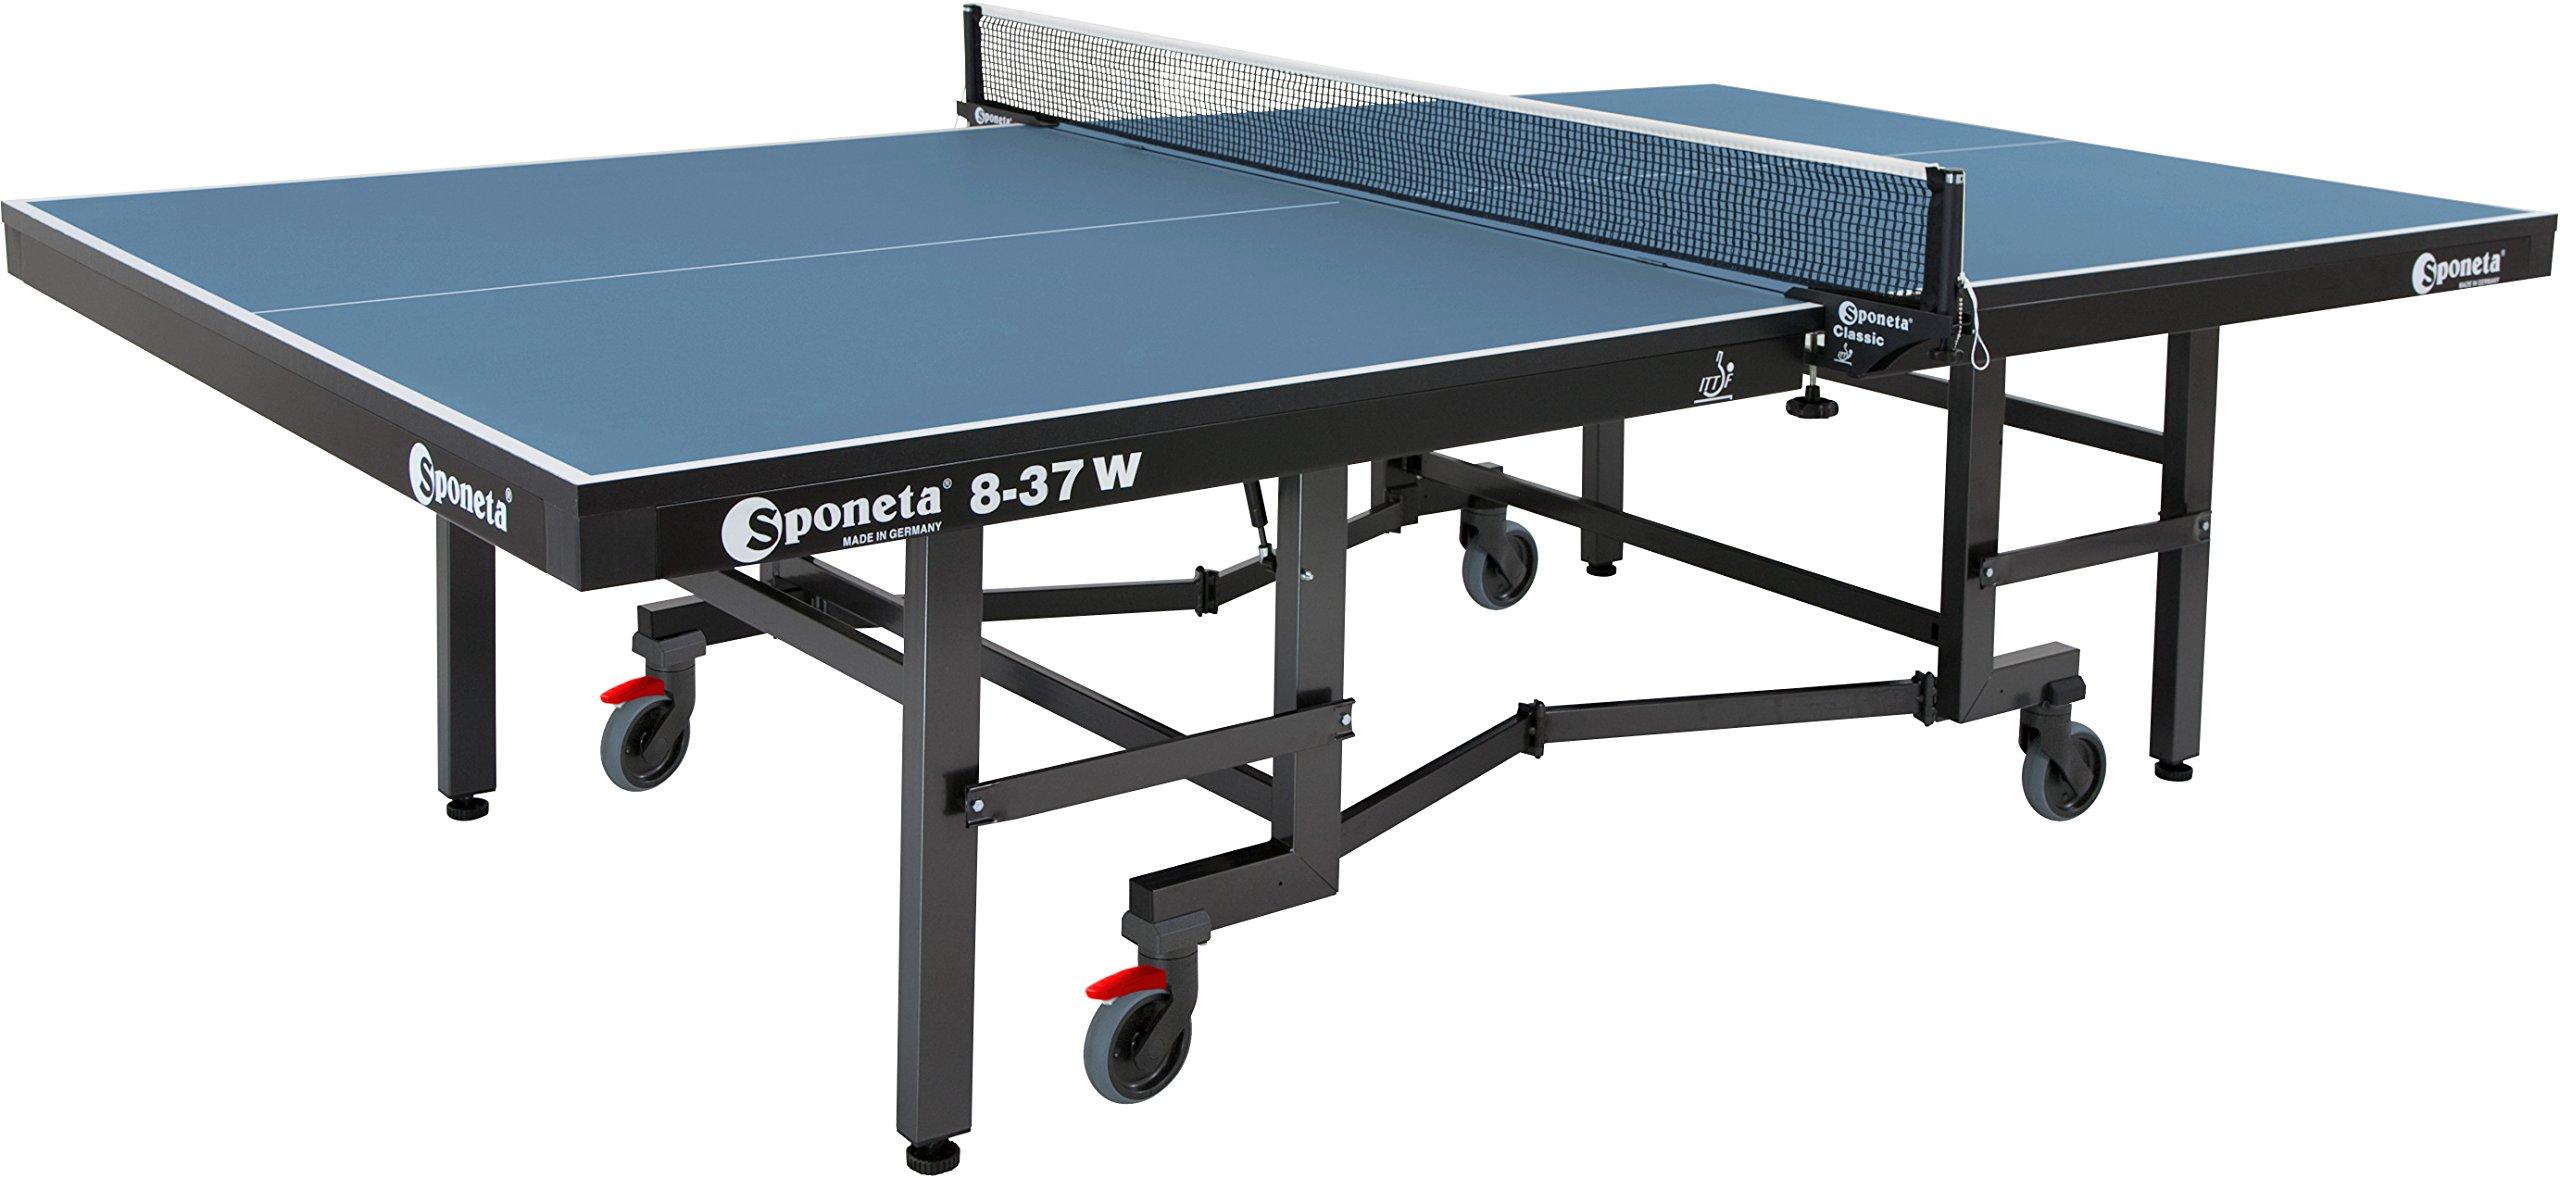 Sponeta Super Compact, 8-37 W Premium Indoor Table Tennis Table, ITTF Tournament Approved by Sponeta